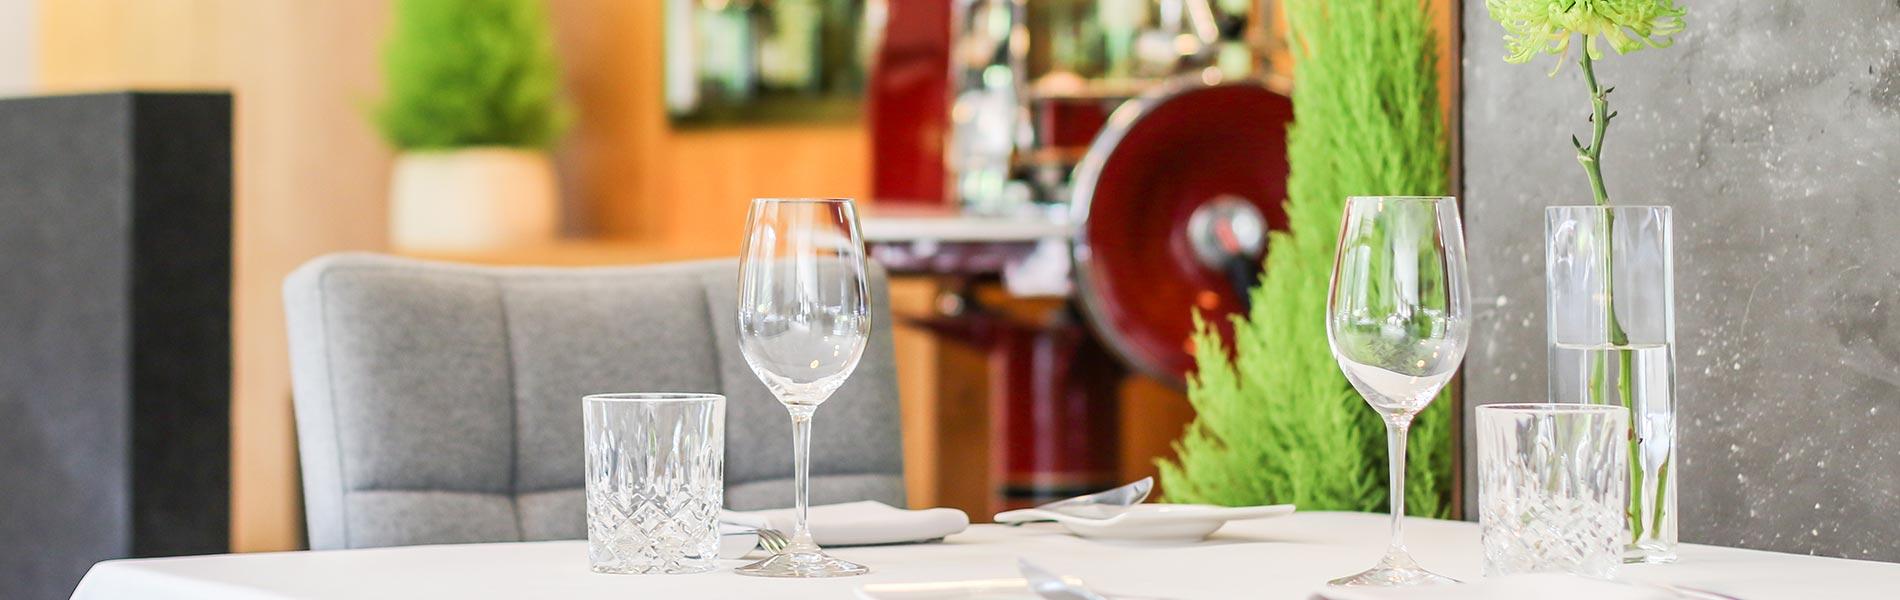 Bistro Restaurant Rosengarten Hotel Rosengarten 5 Sterne Hotel Relais & Châteaux Hotel Kirchberg Tirol Austria